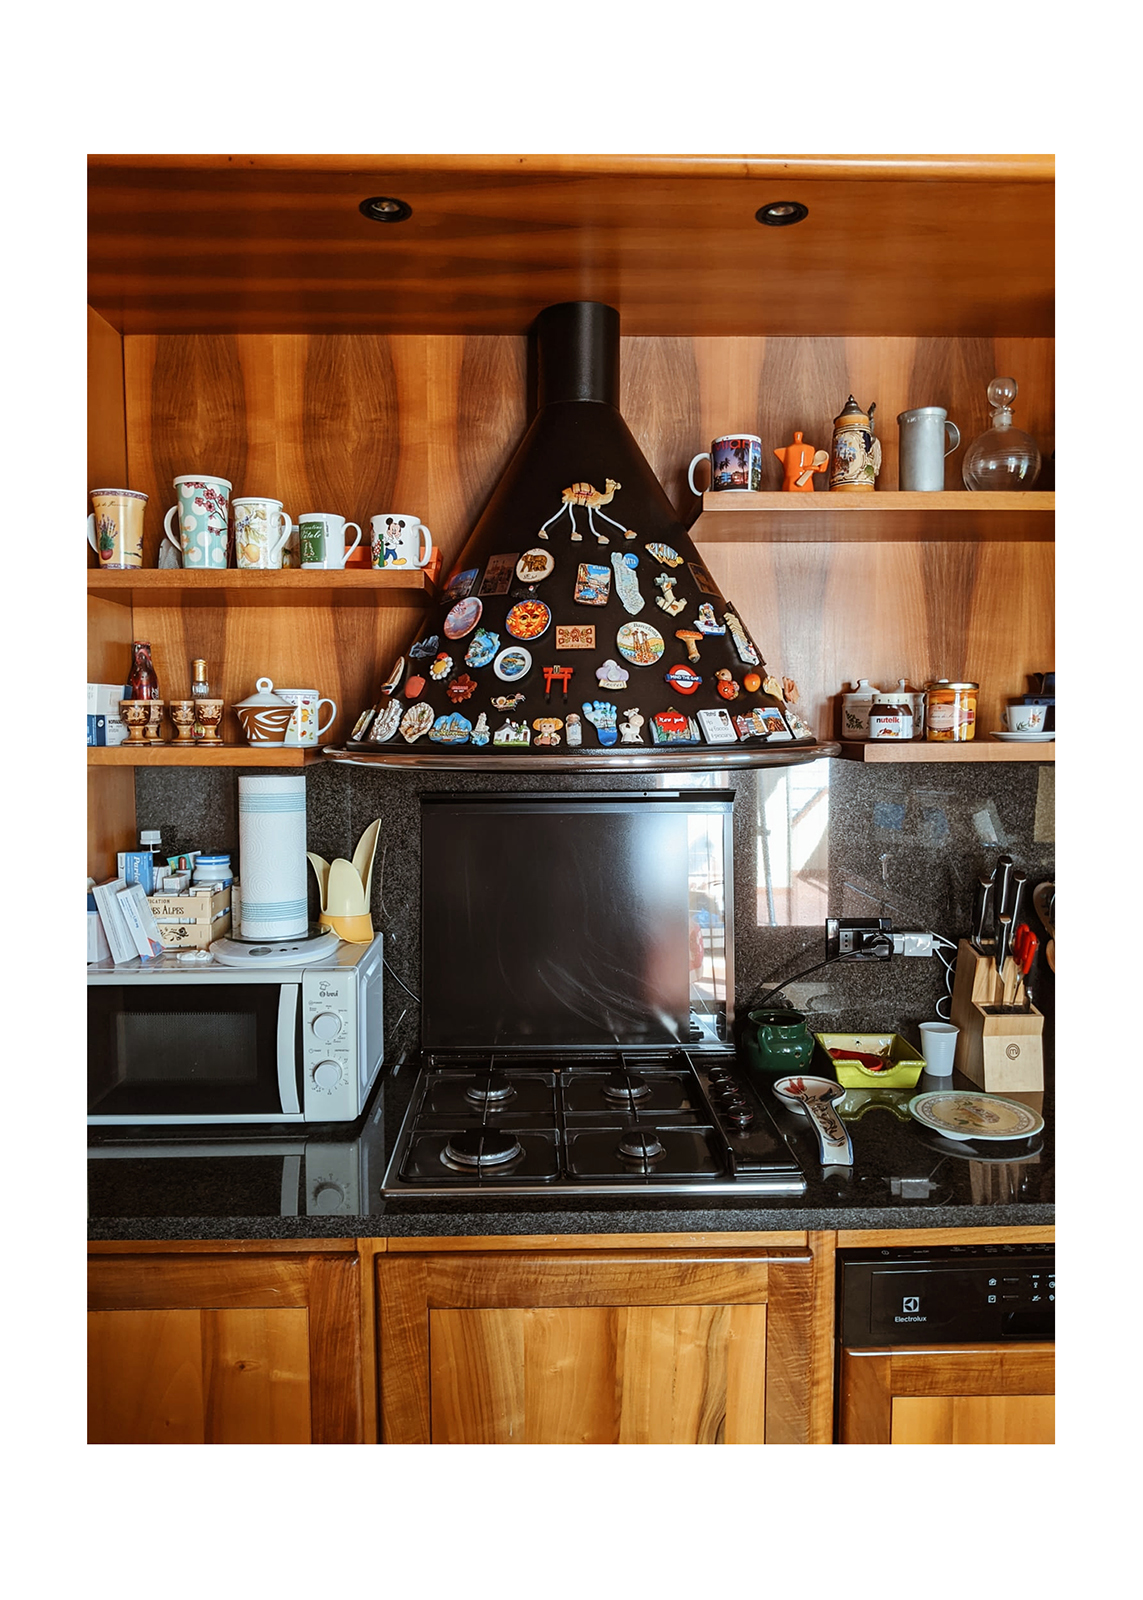 paola ressa cucine 10